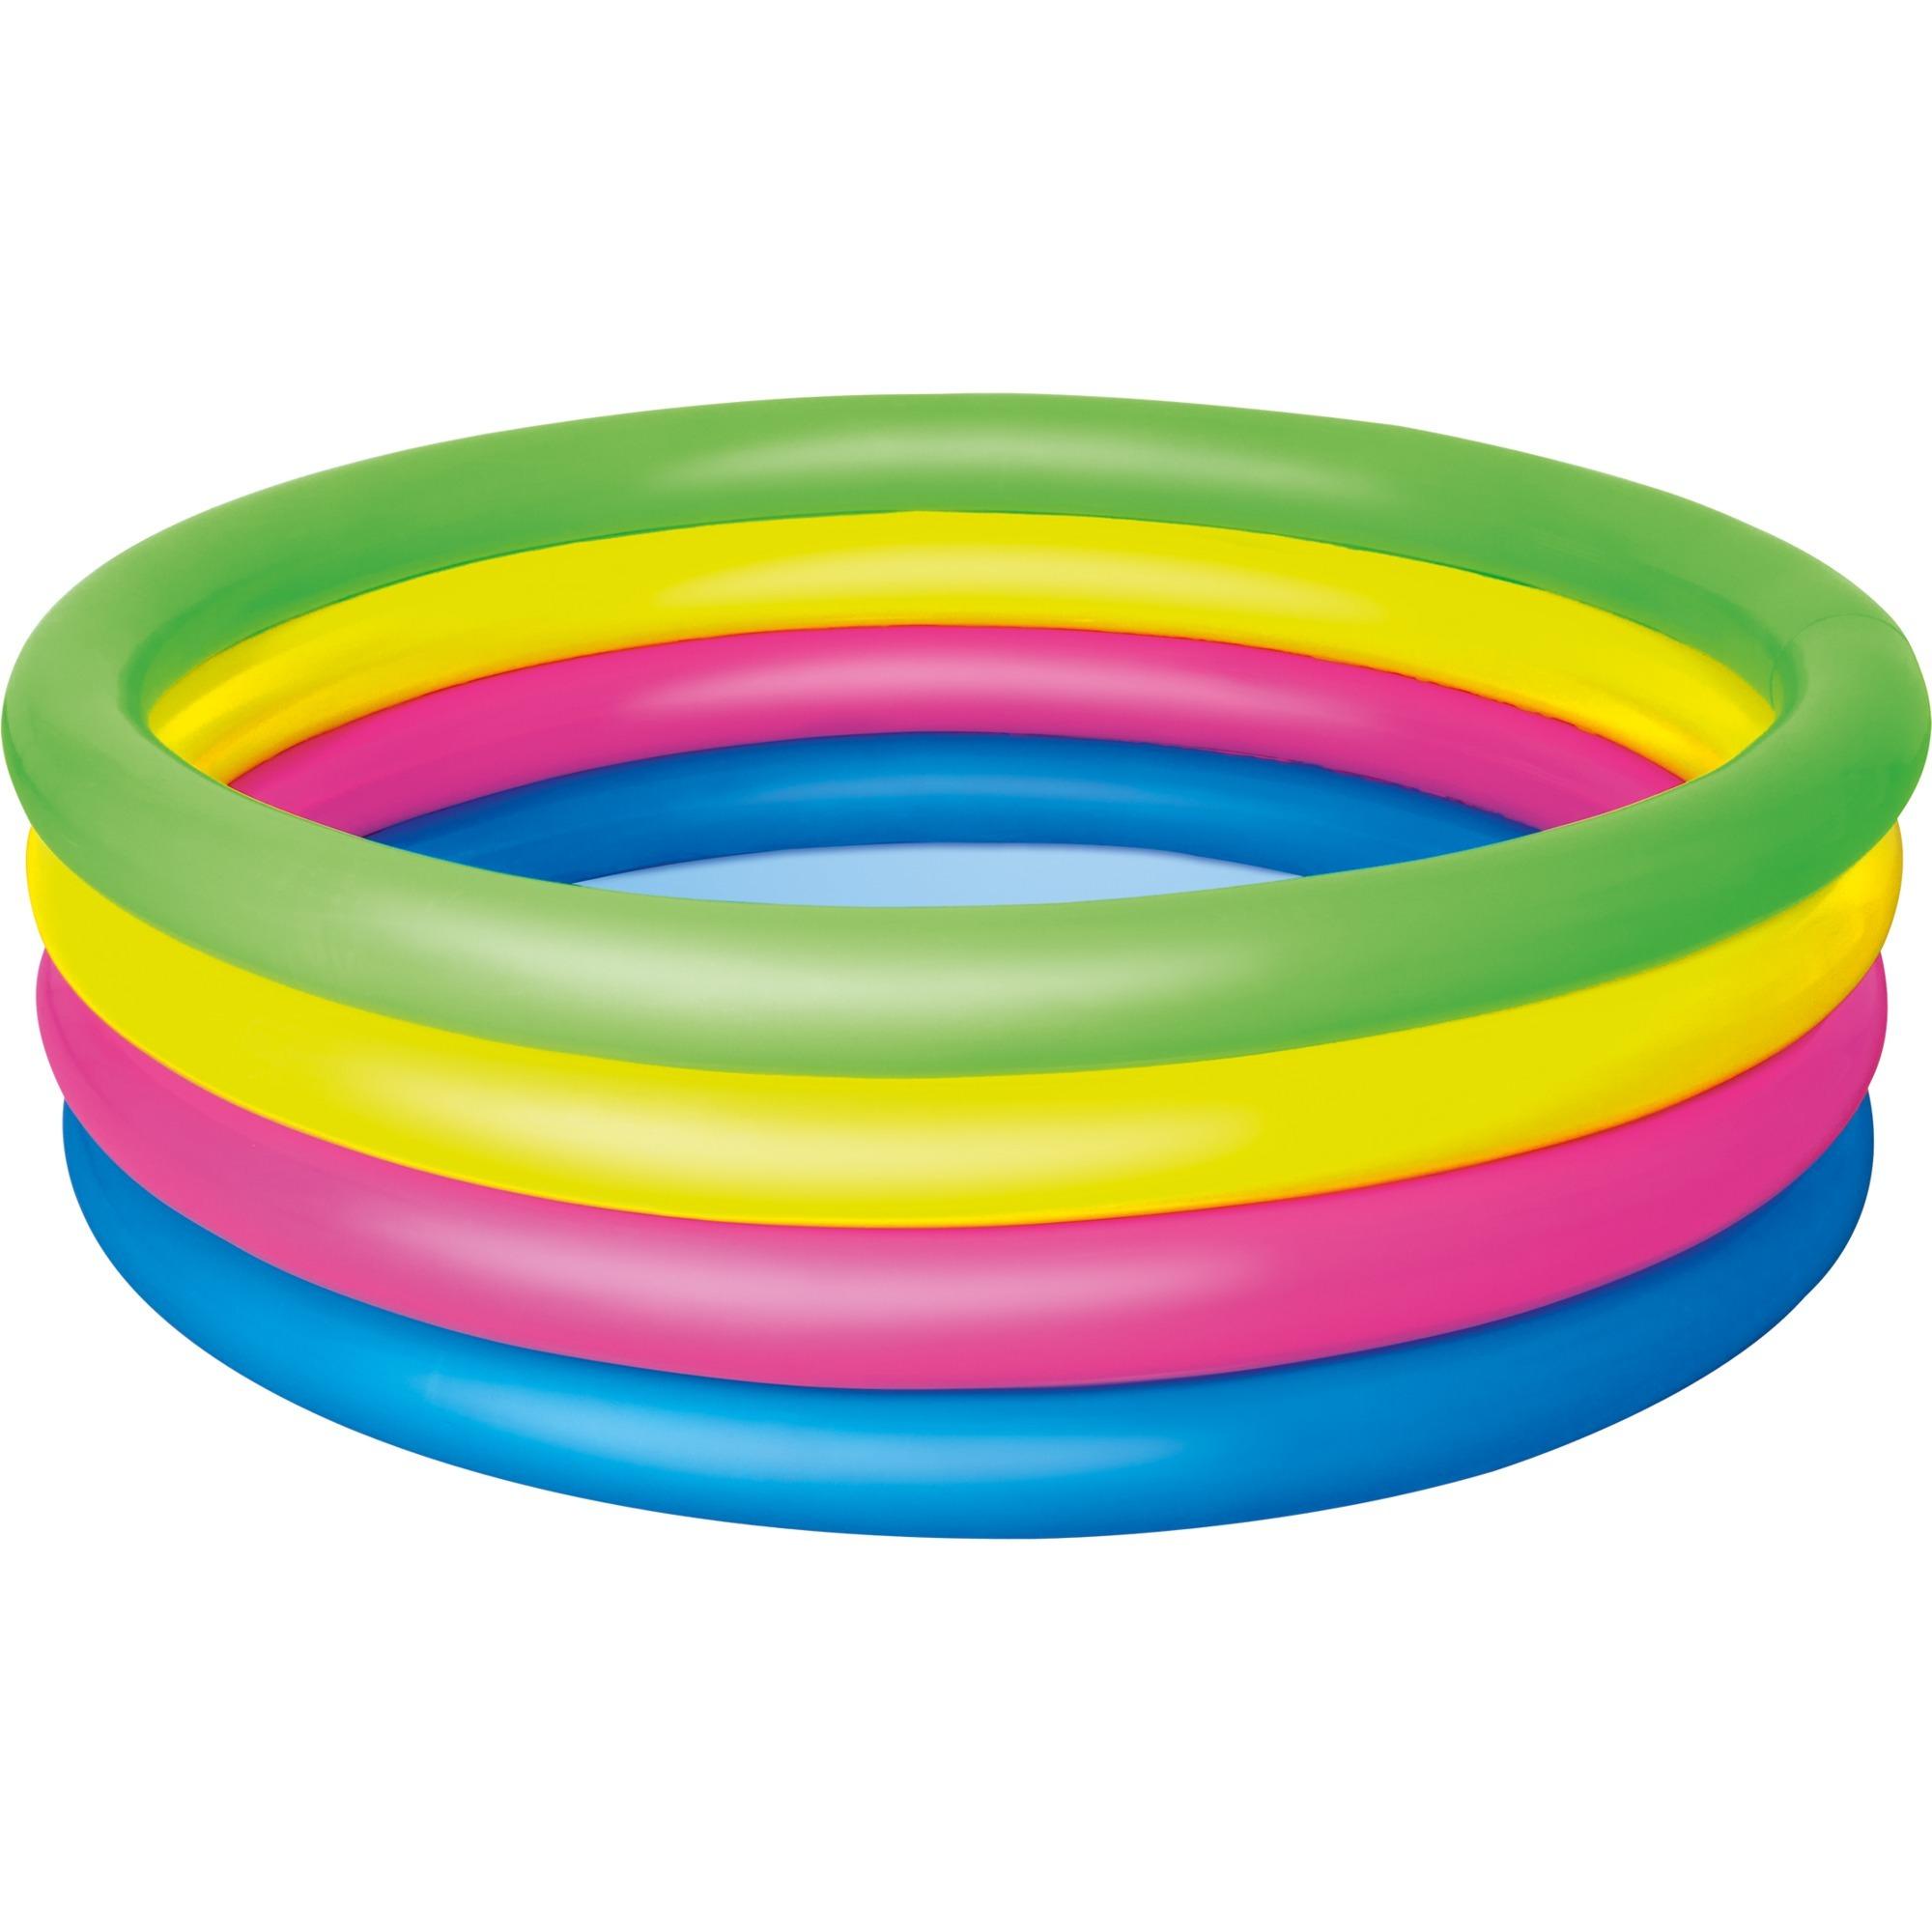 51117-522l-vinyl-legebassin-til-born-swimming-pool